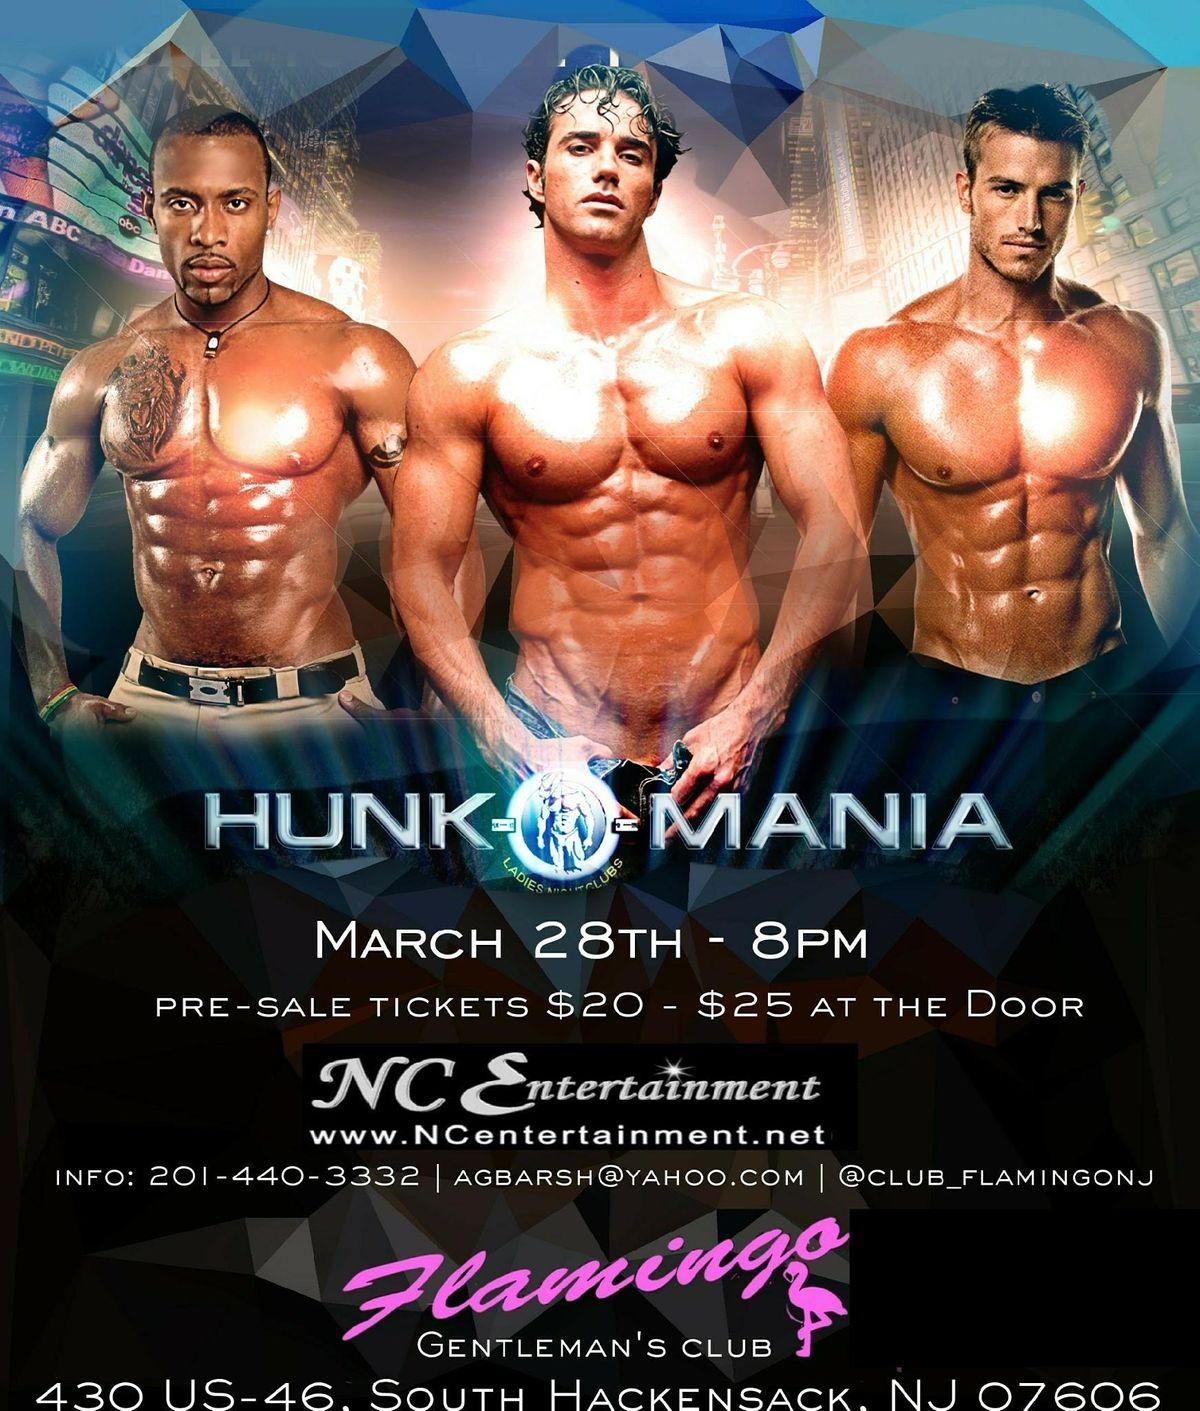 Hunk-O-Mania Male Revue Strip Show Club - San Diego, CA | Event in Chula Vista | AllEvents.in